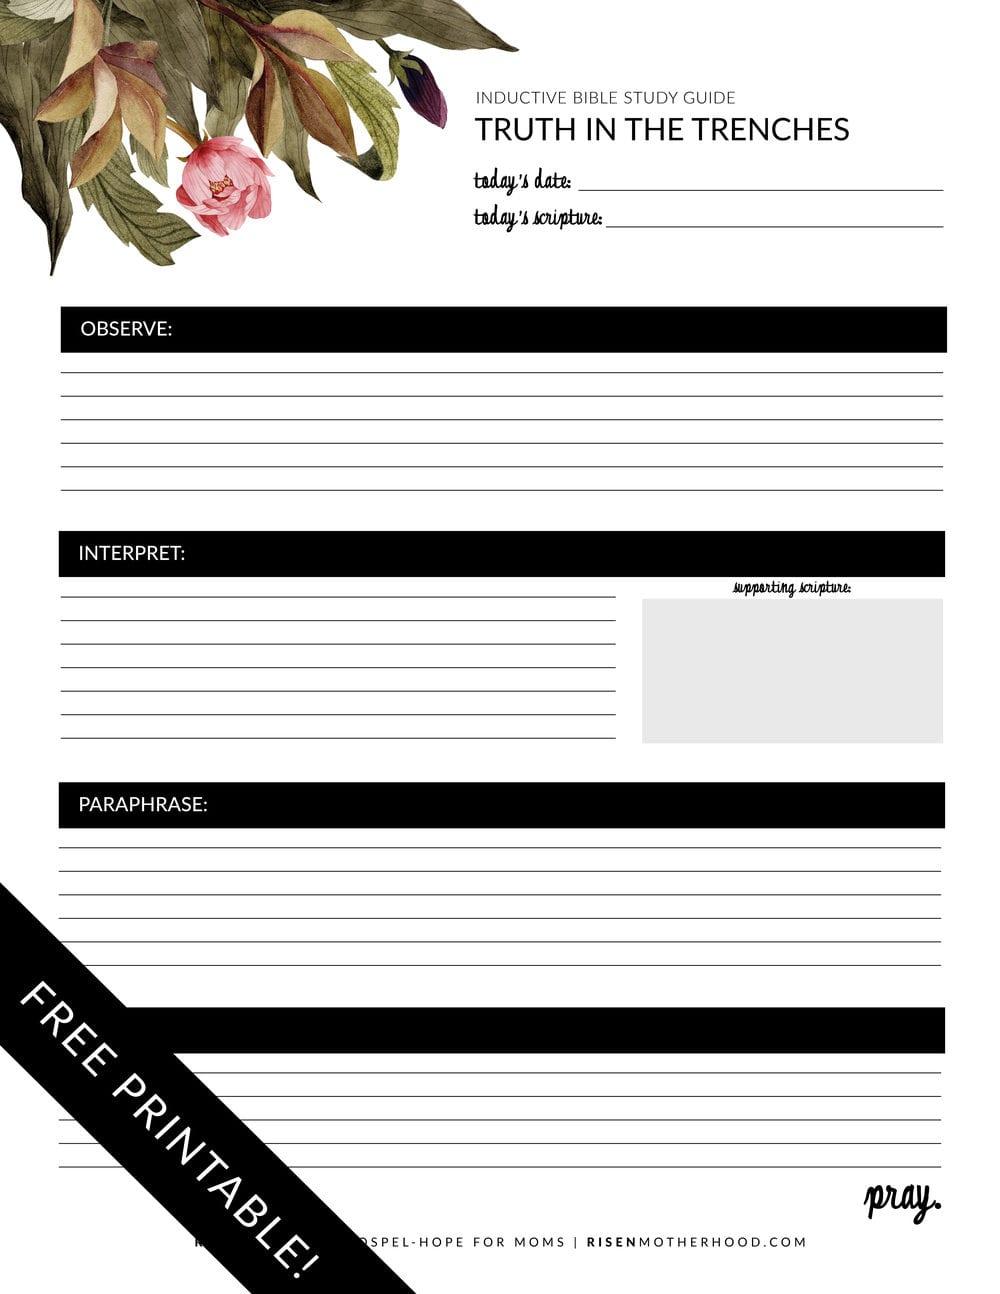 Free Printable Inductive Bible Study Worksheets  Companion Card Also Bible Study Worksheets For Adults